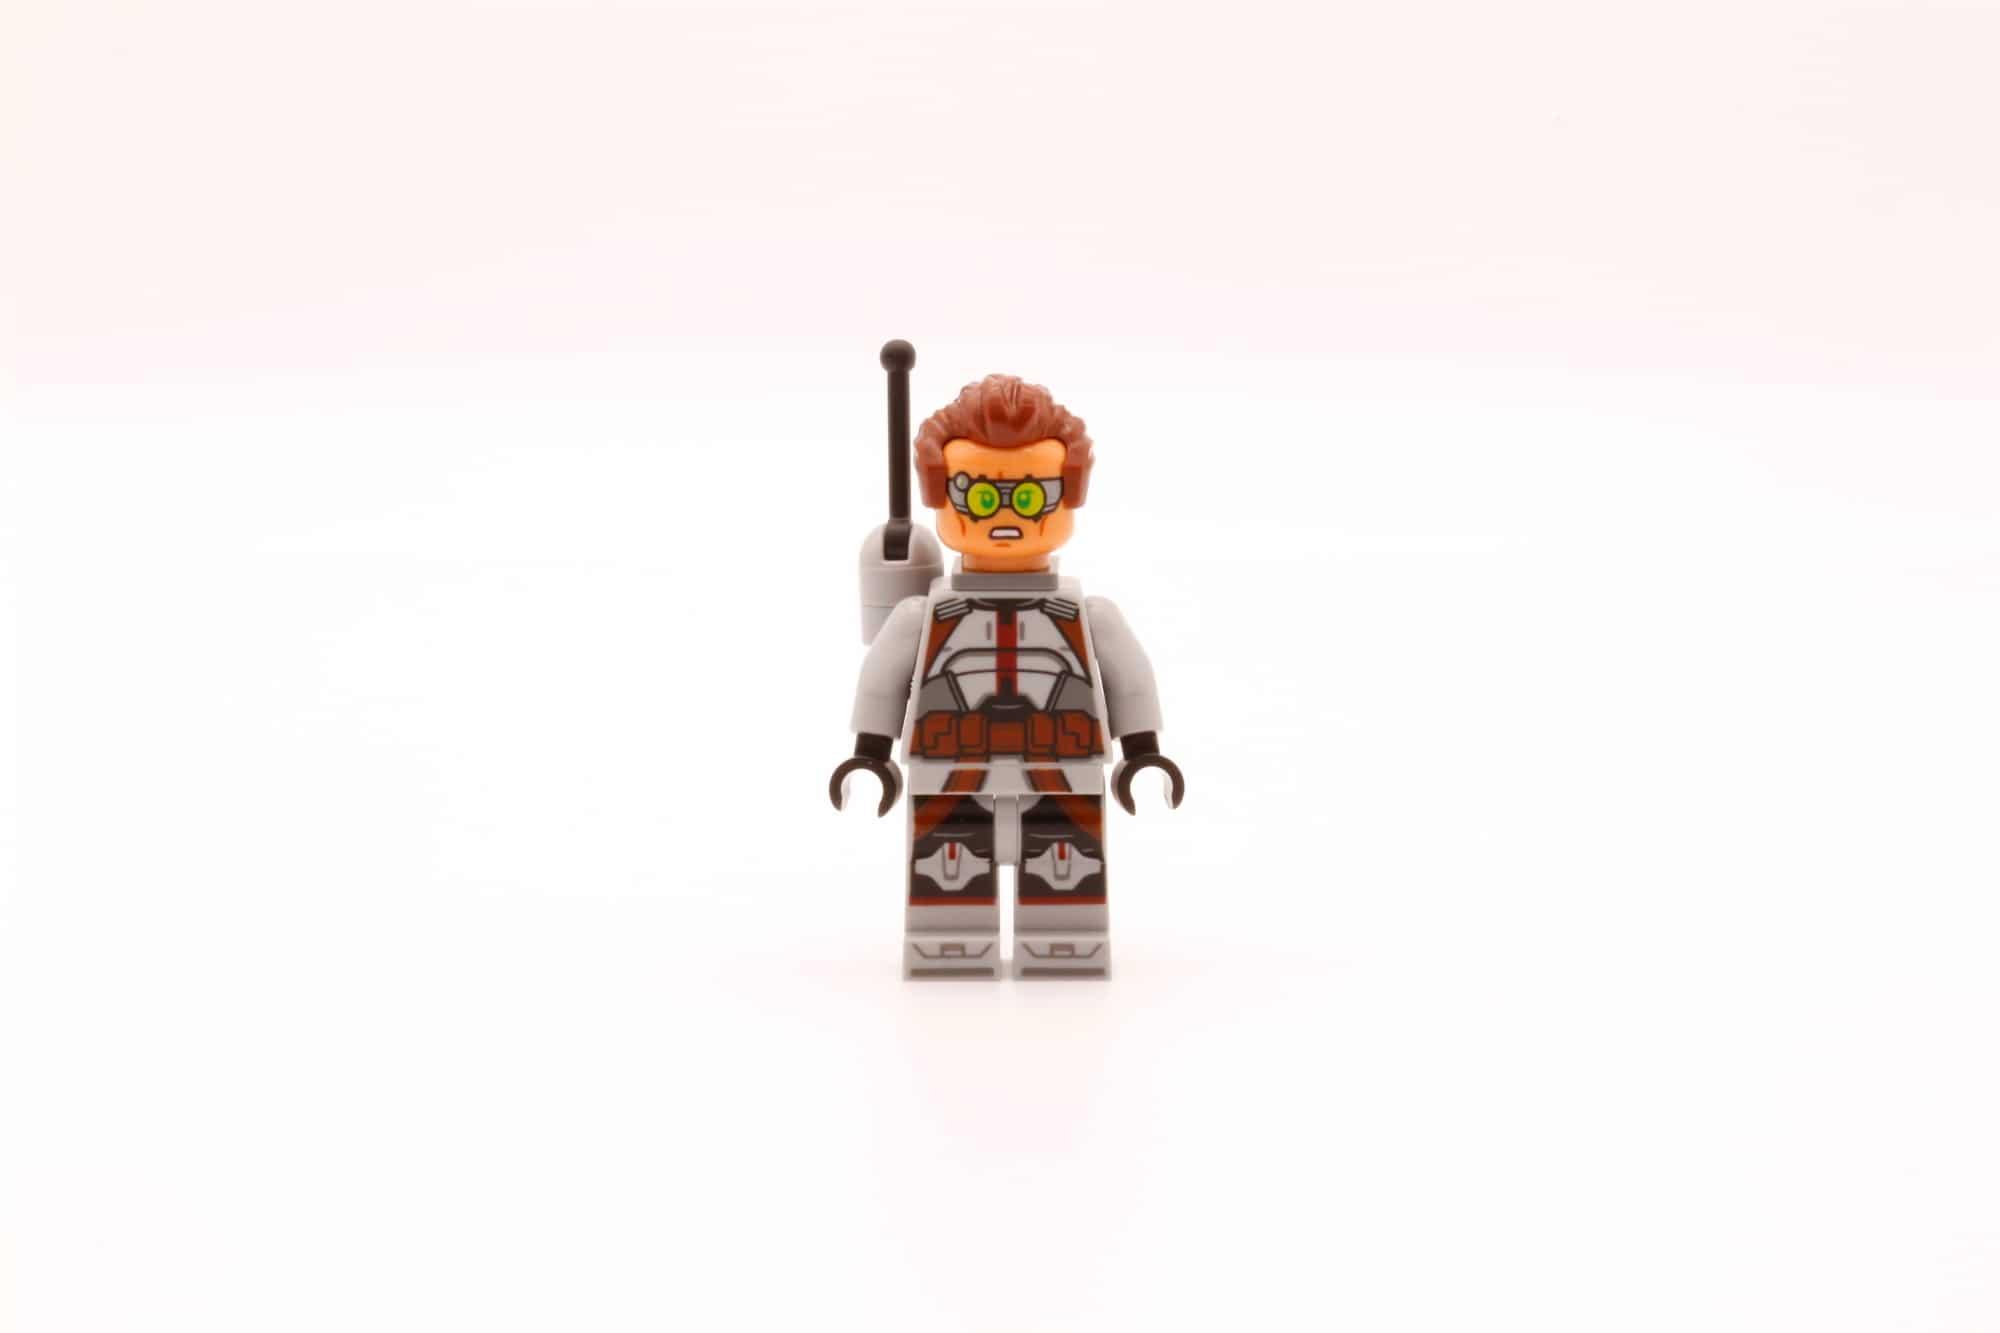 LEGO Star Wars 75314 The Bad Batch Attack Shuttle Tech Haare